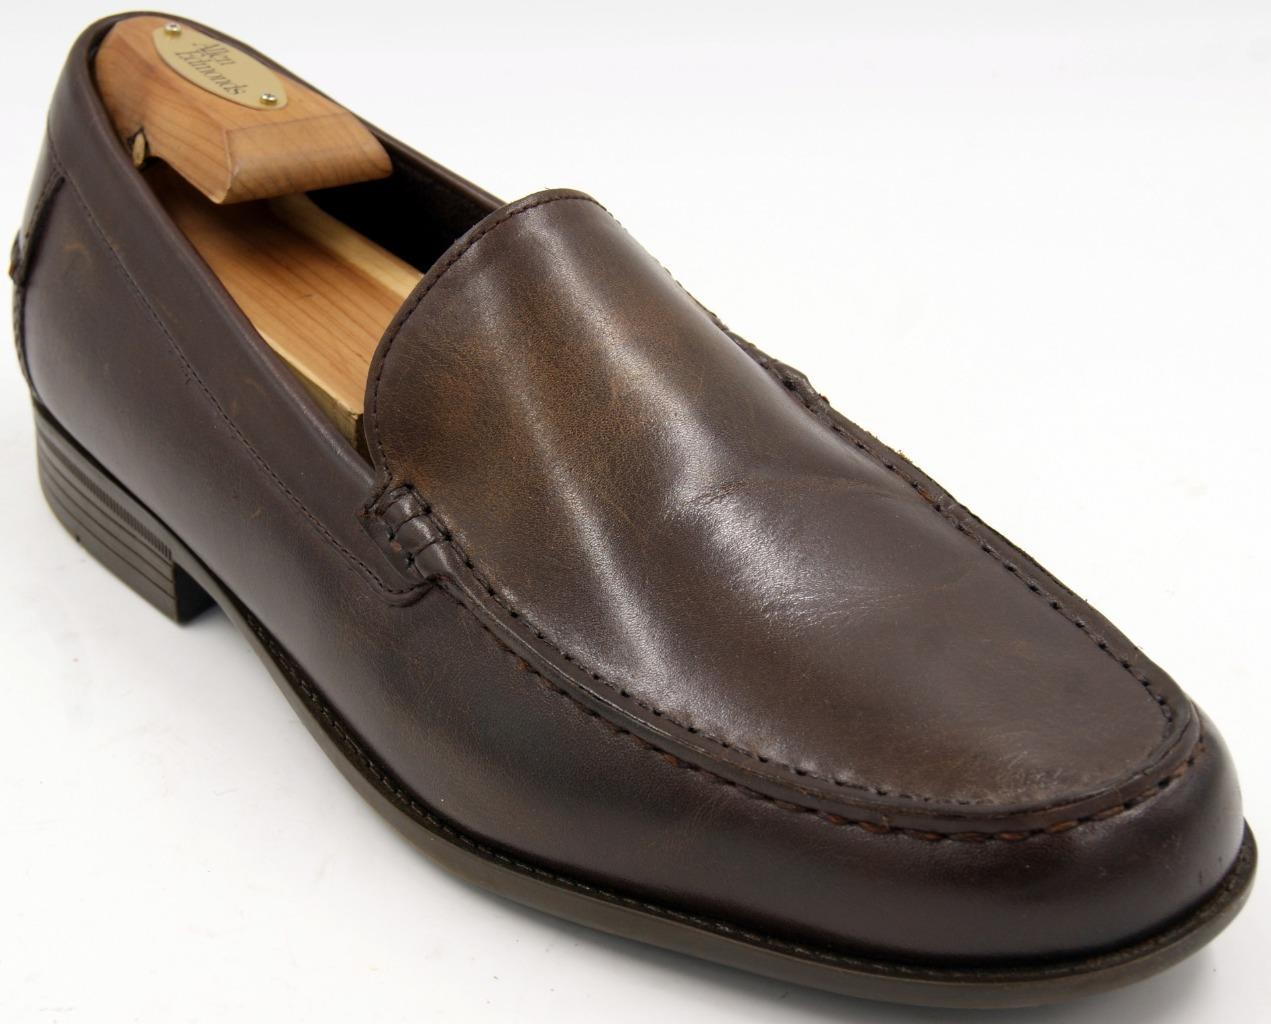 Cole Haan Dustin Venetian II Brown Loafer Men's Shoes Sz 11 M EUC